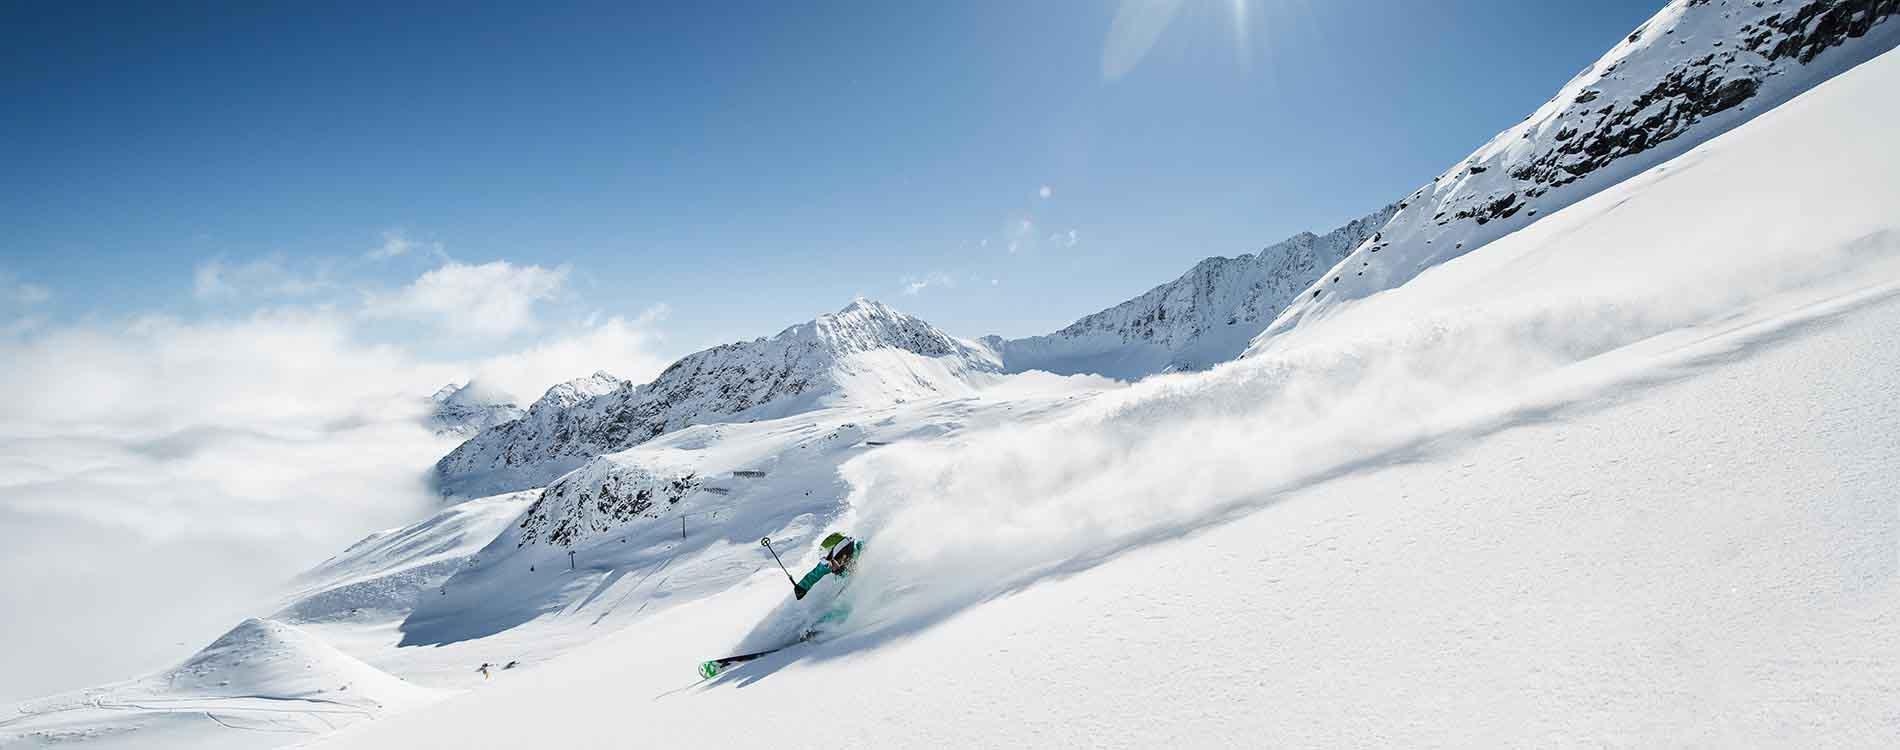 Stubai Super Ski @Happy Stubai Stubai in Neustift in the Austrian Tyrol - Niche Destinations